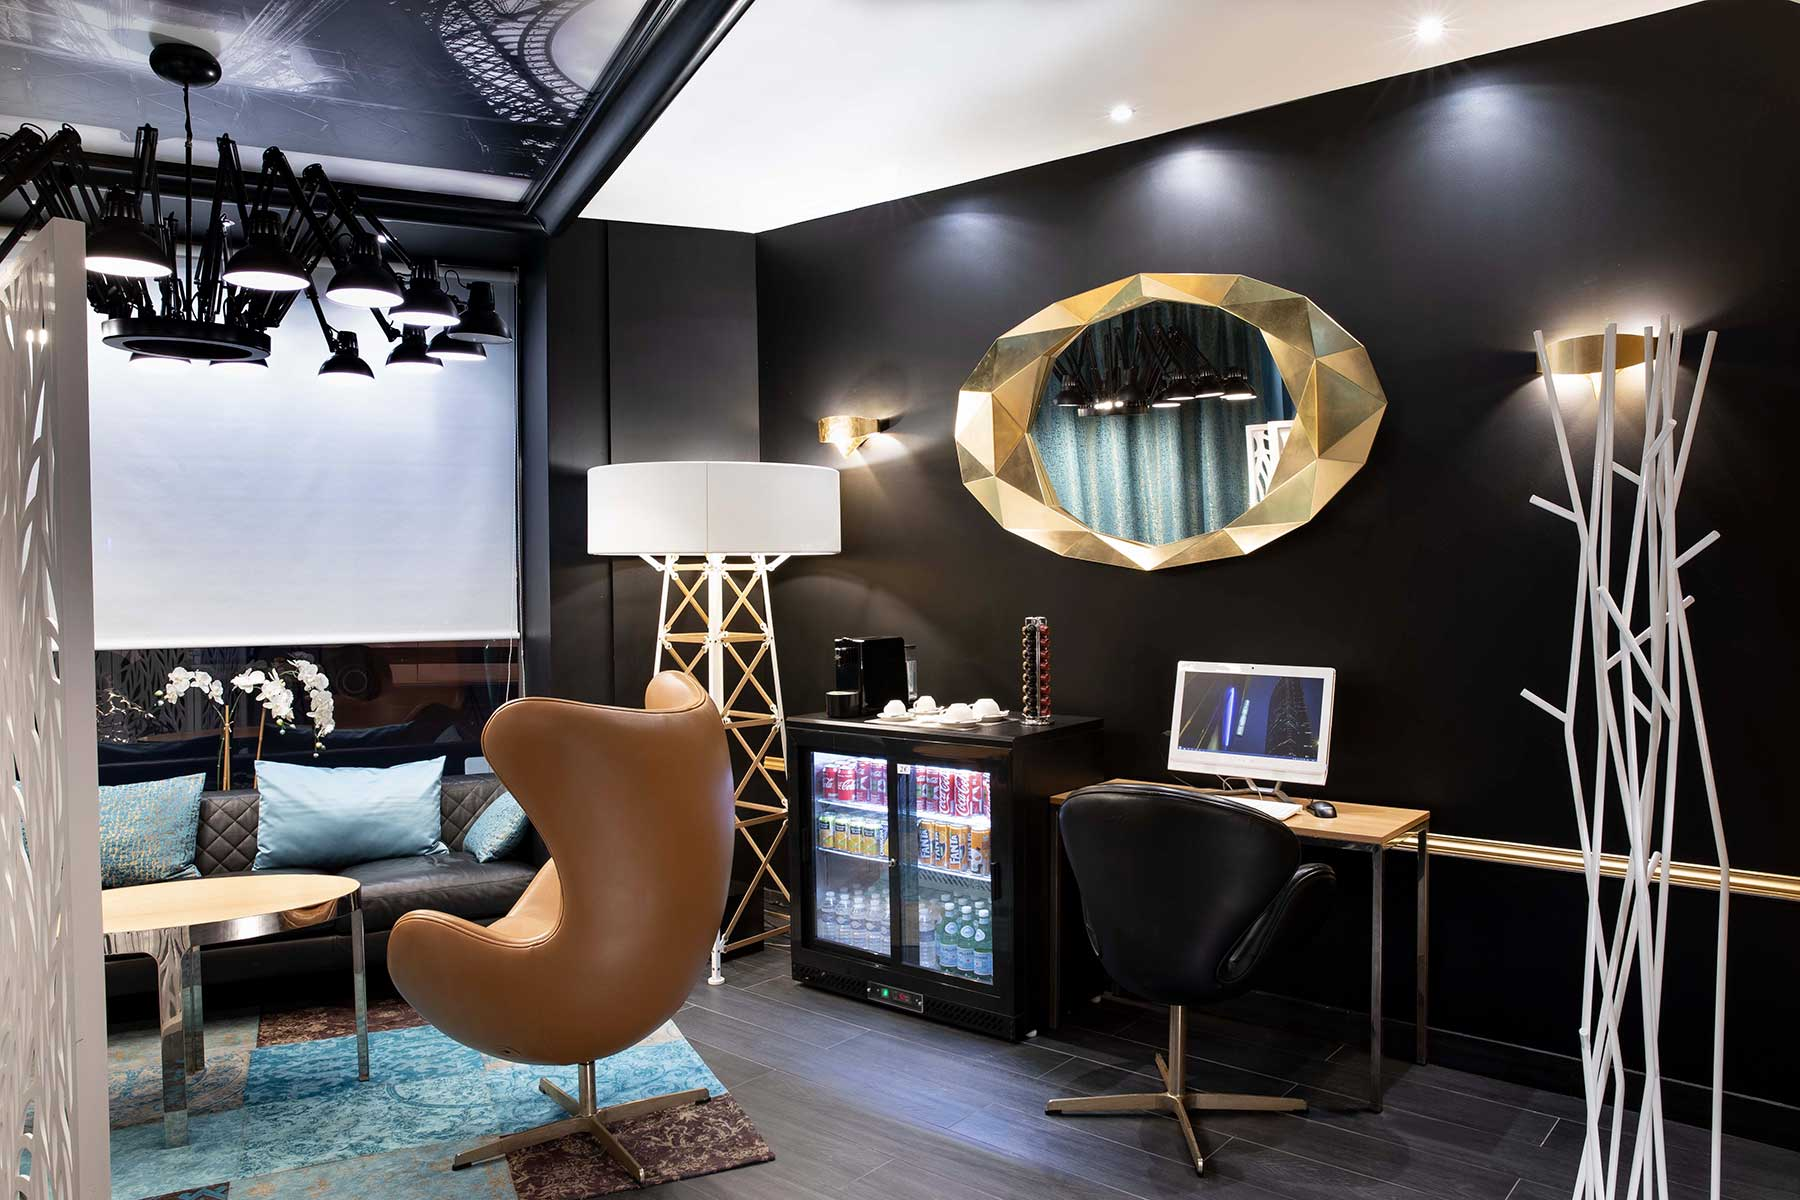 salon-hotel-montparnasse-saint-germain